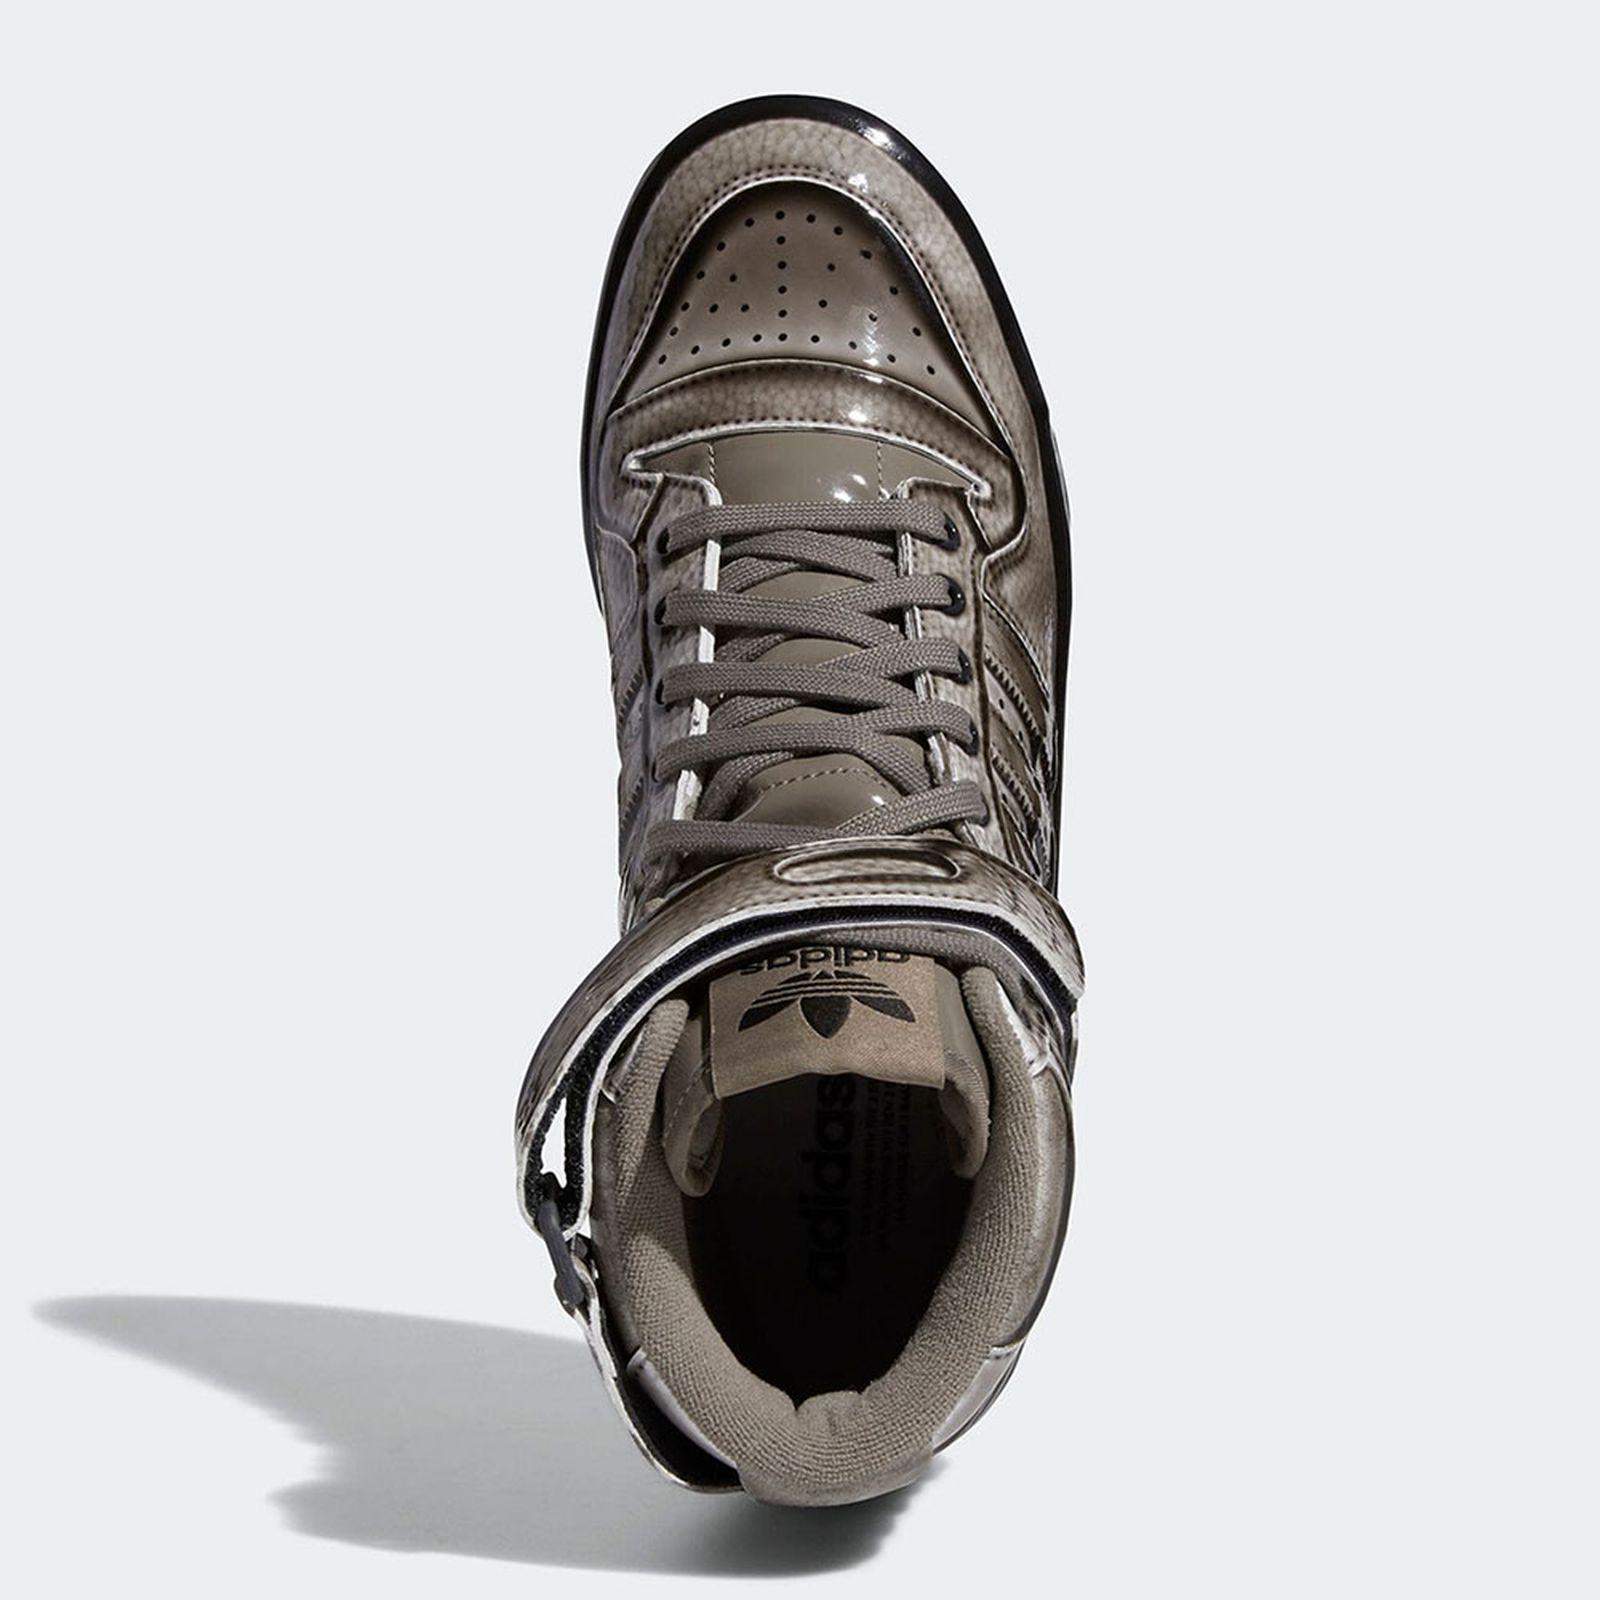 jeremy-scott-adidas-forum-hi-release-date-price-20